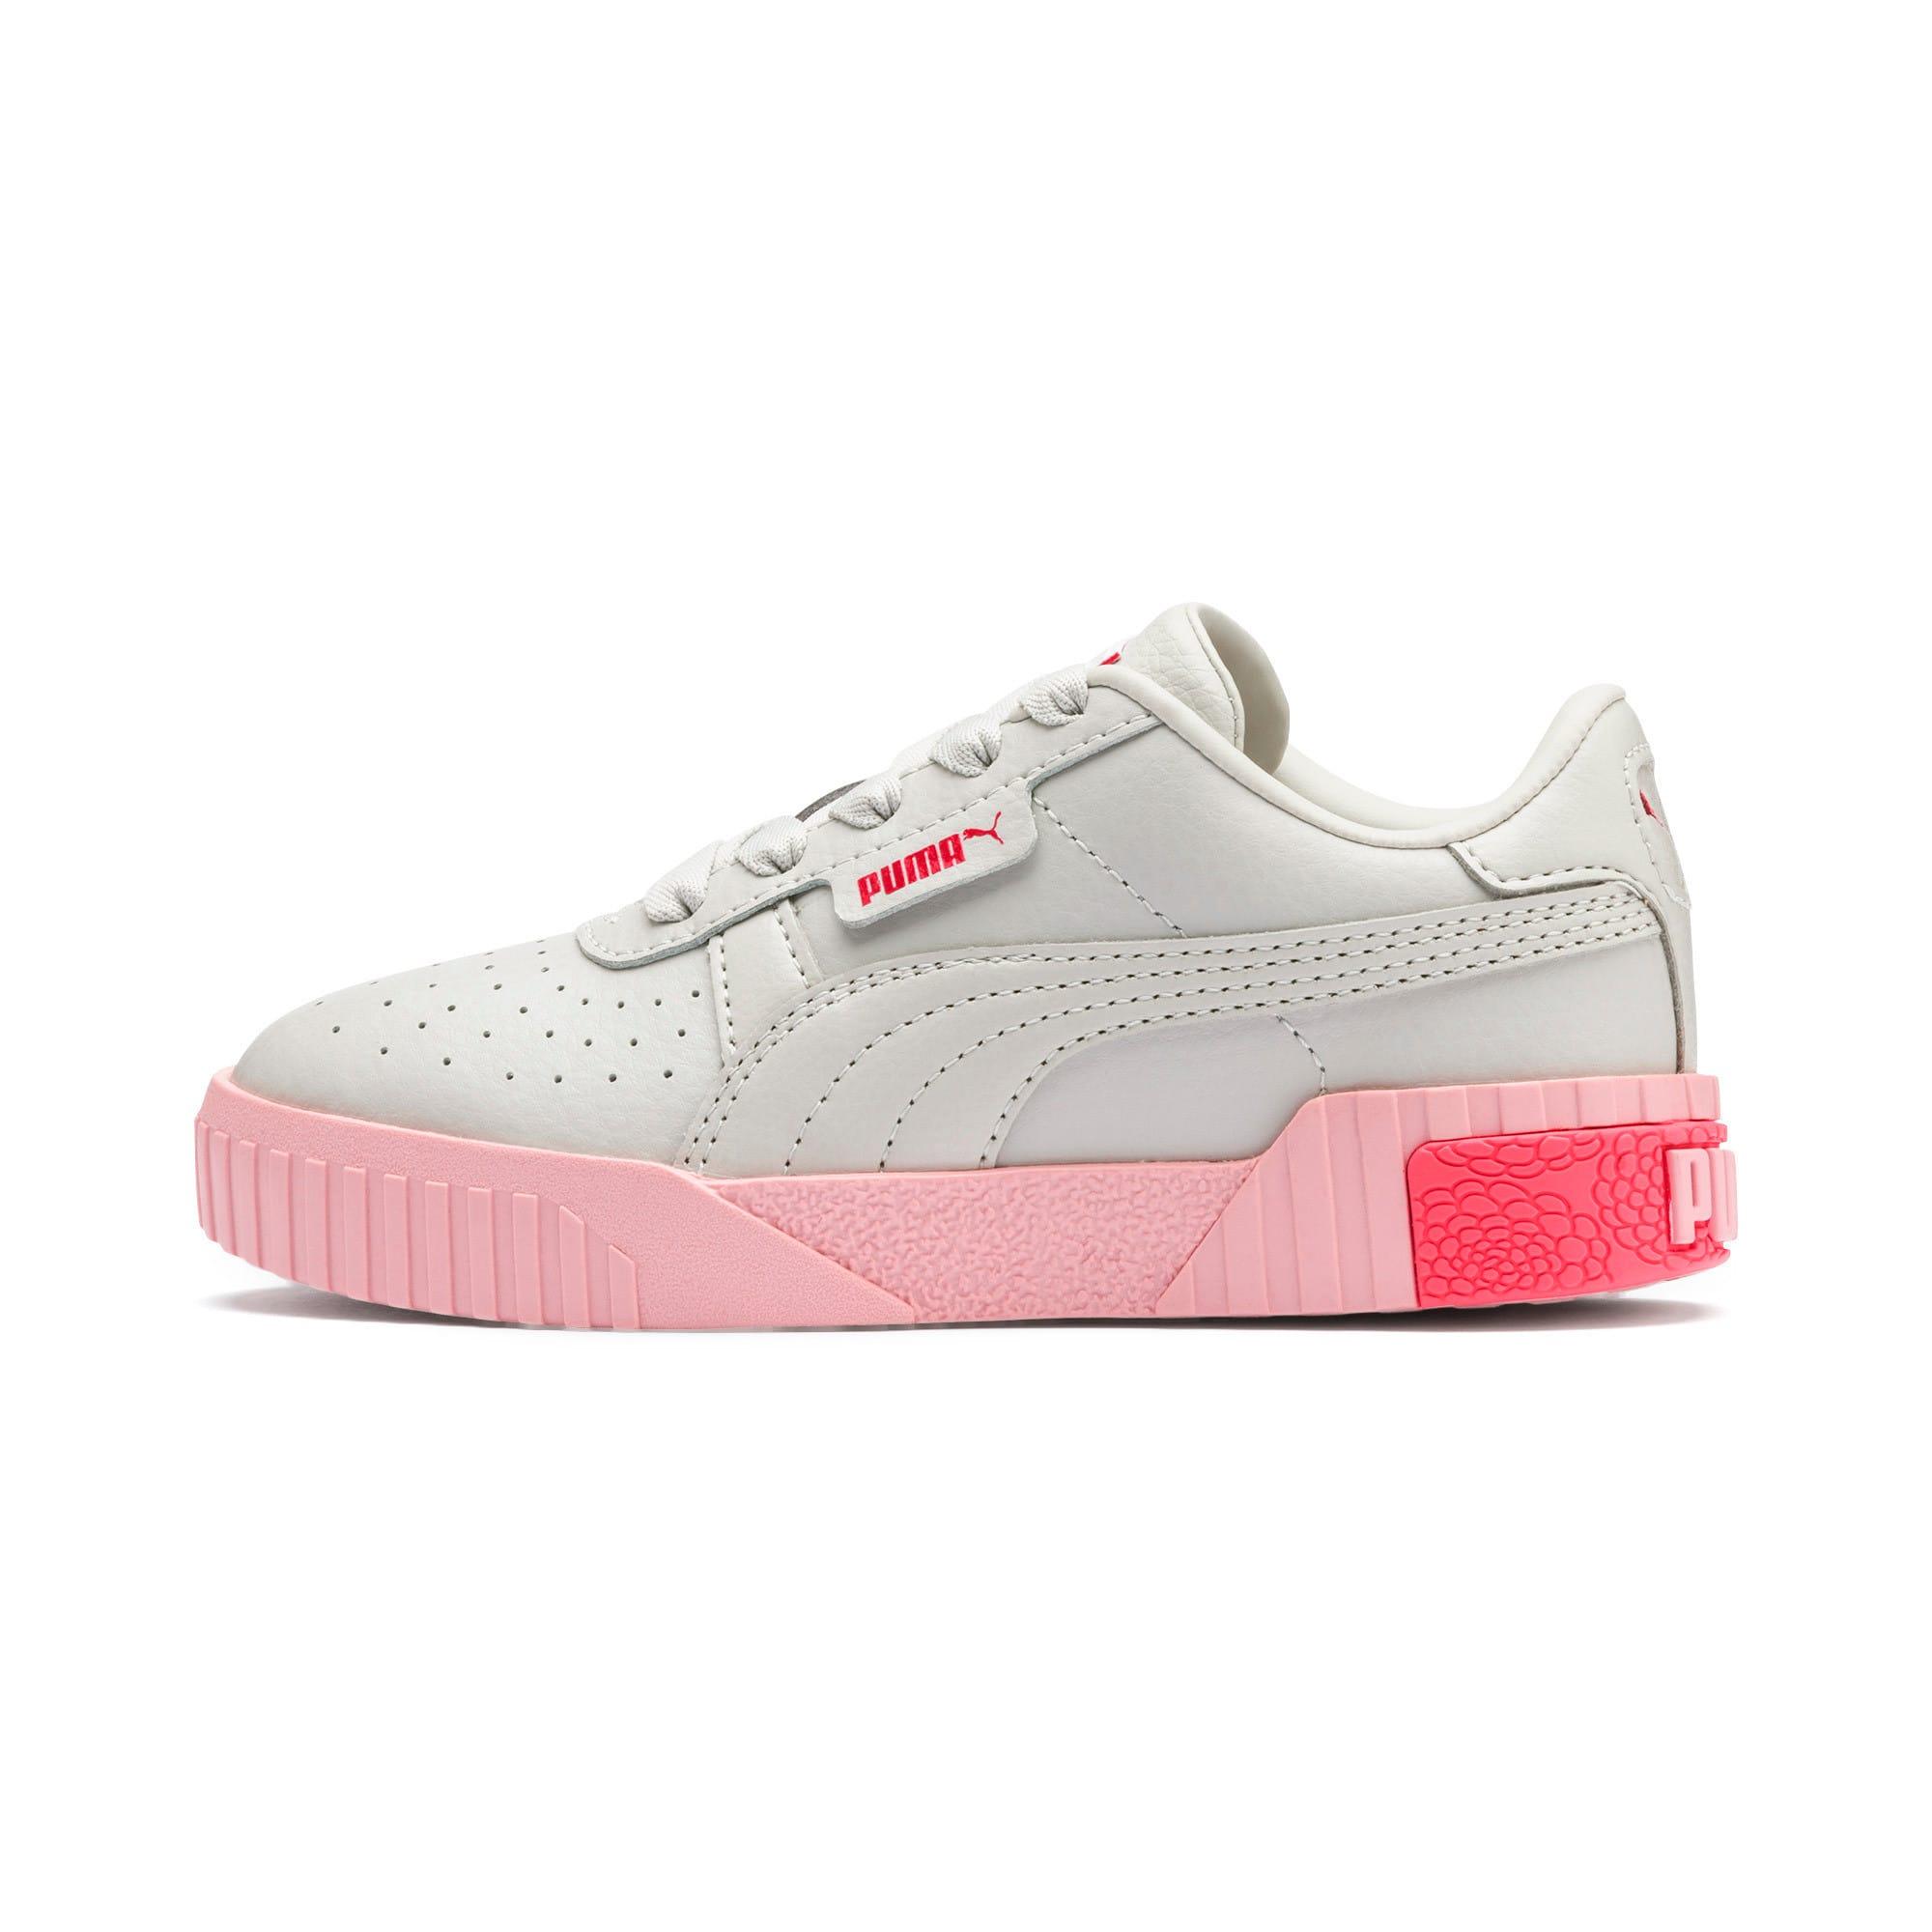 Thumbnail 1 of Cali Kids' Mädchen Sneaker, Gray Violet-Calypso Coral, medium